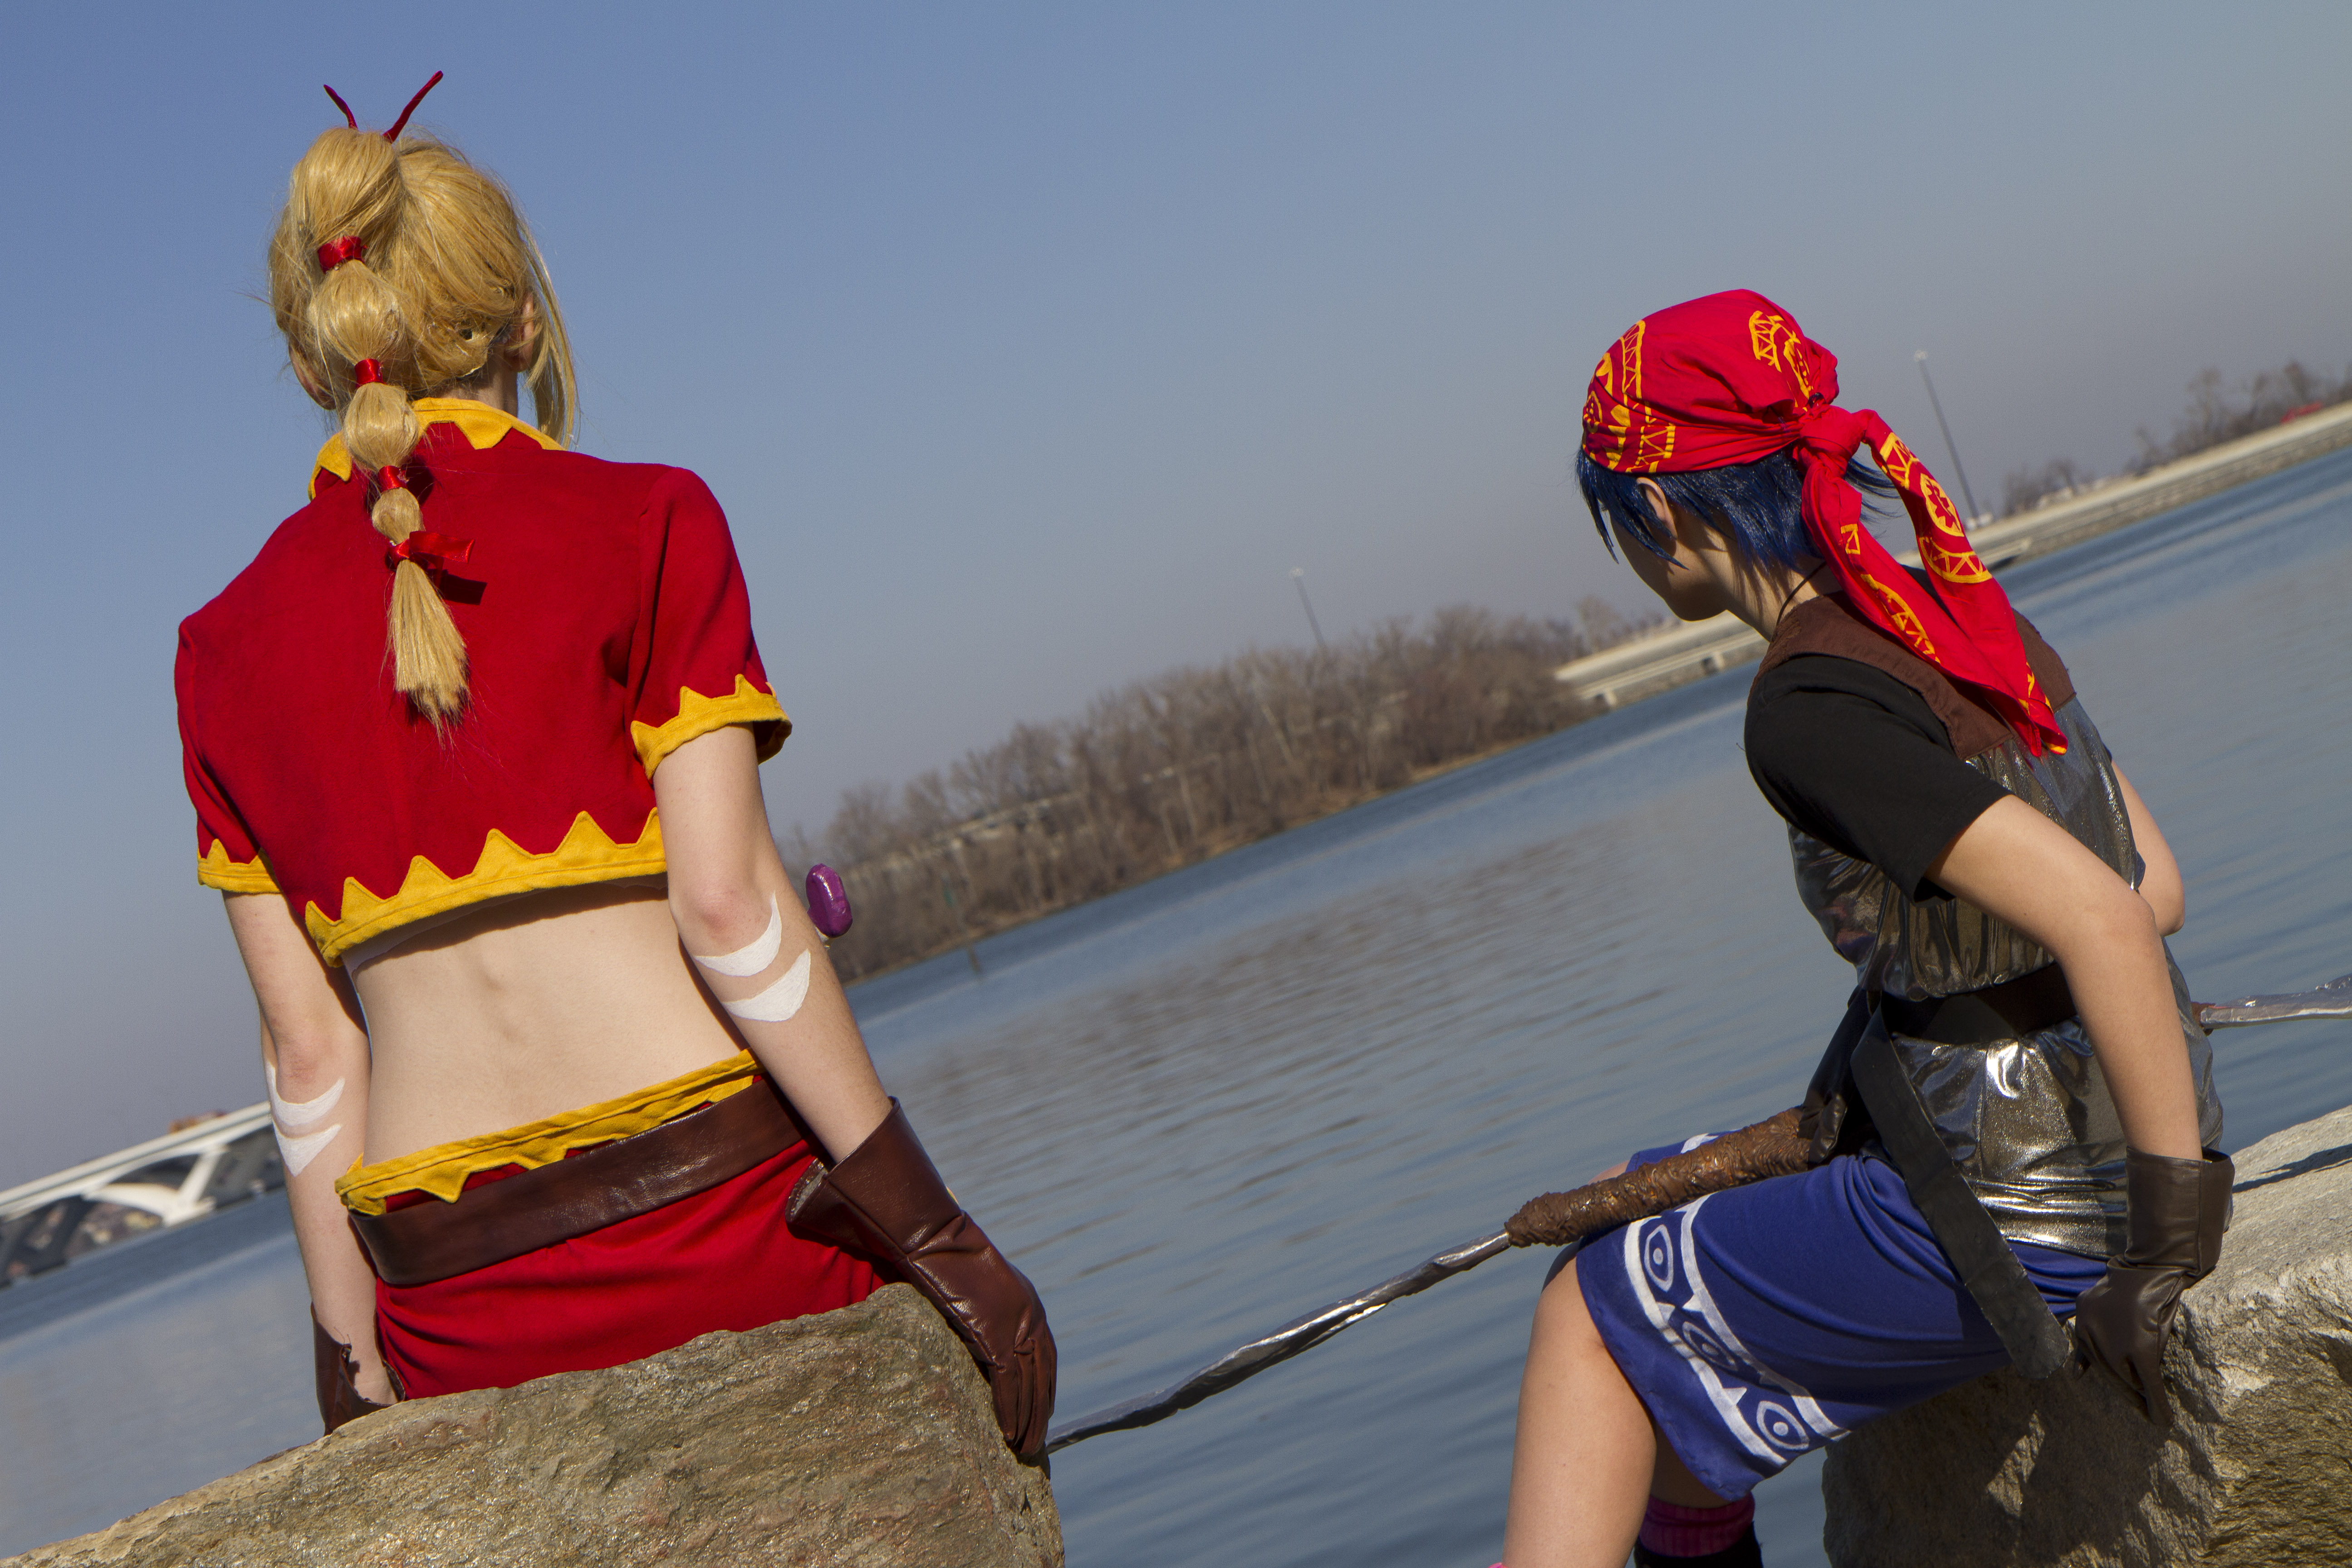 Chrono Cross - Kidd and Serge Photoshoot 6 by octomobiki